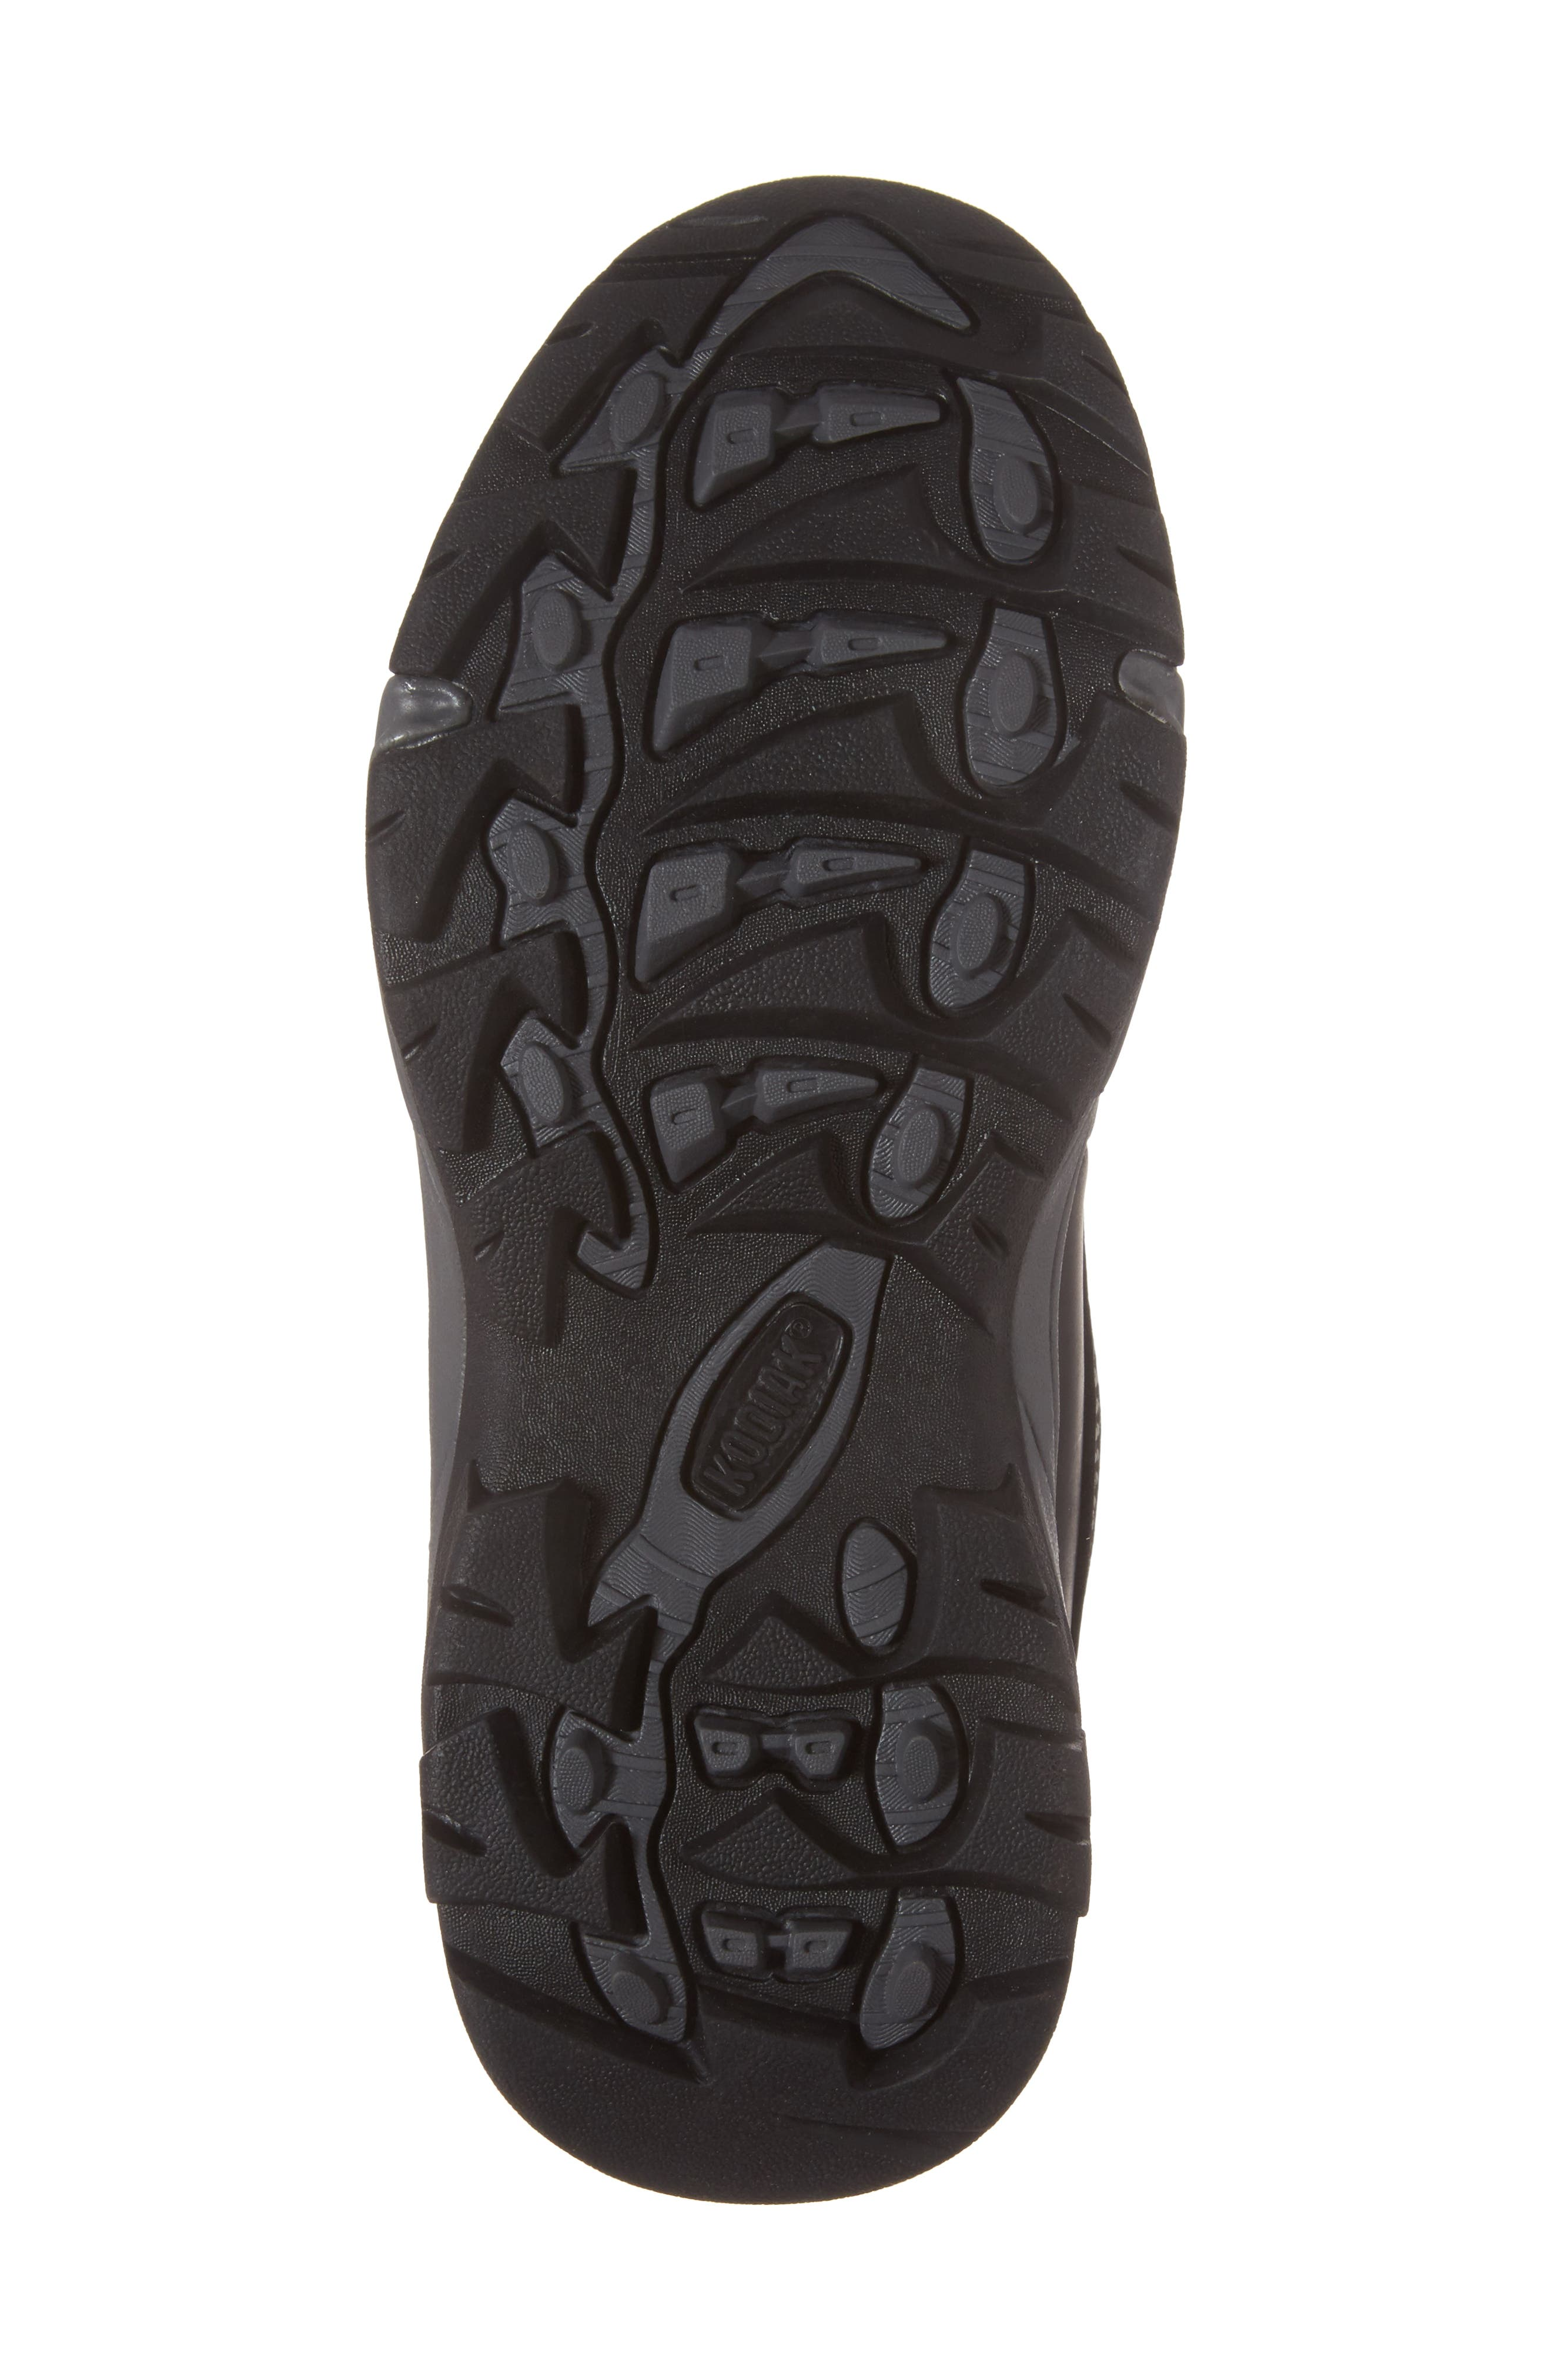 'Renee' Waterproof Insulated Winter Boot,                             Alternate thumbnail 6, color,                             001